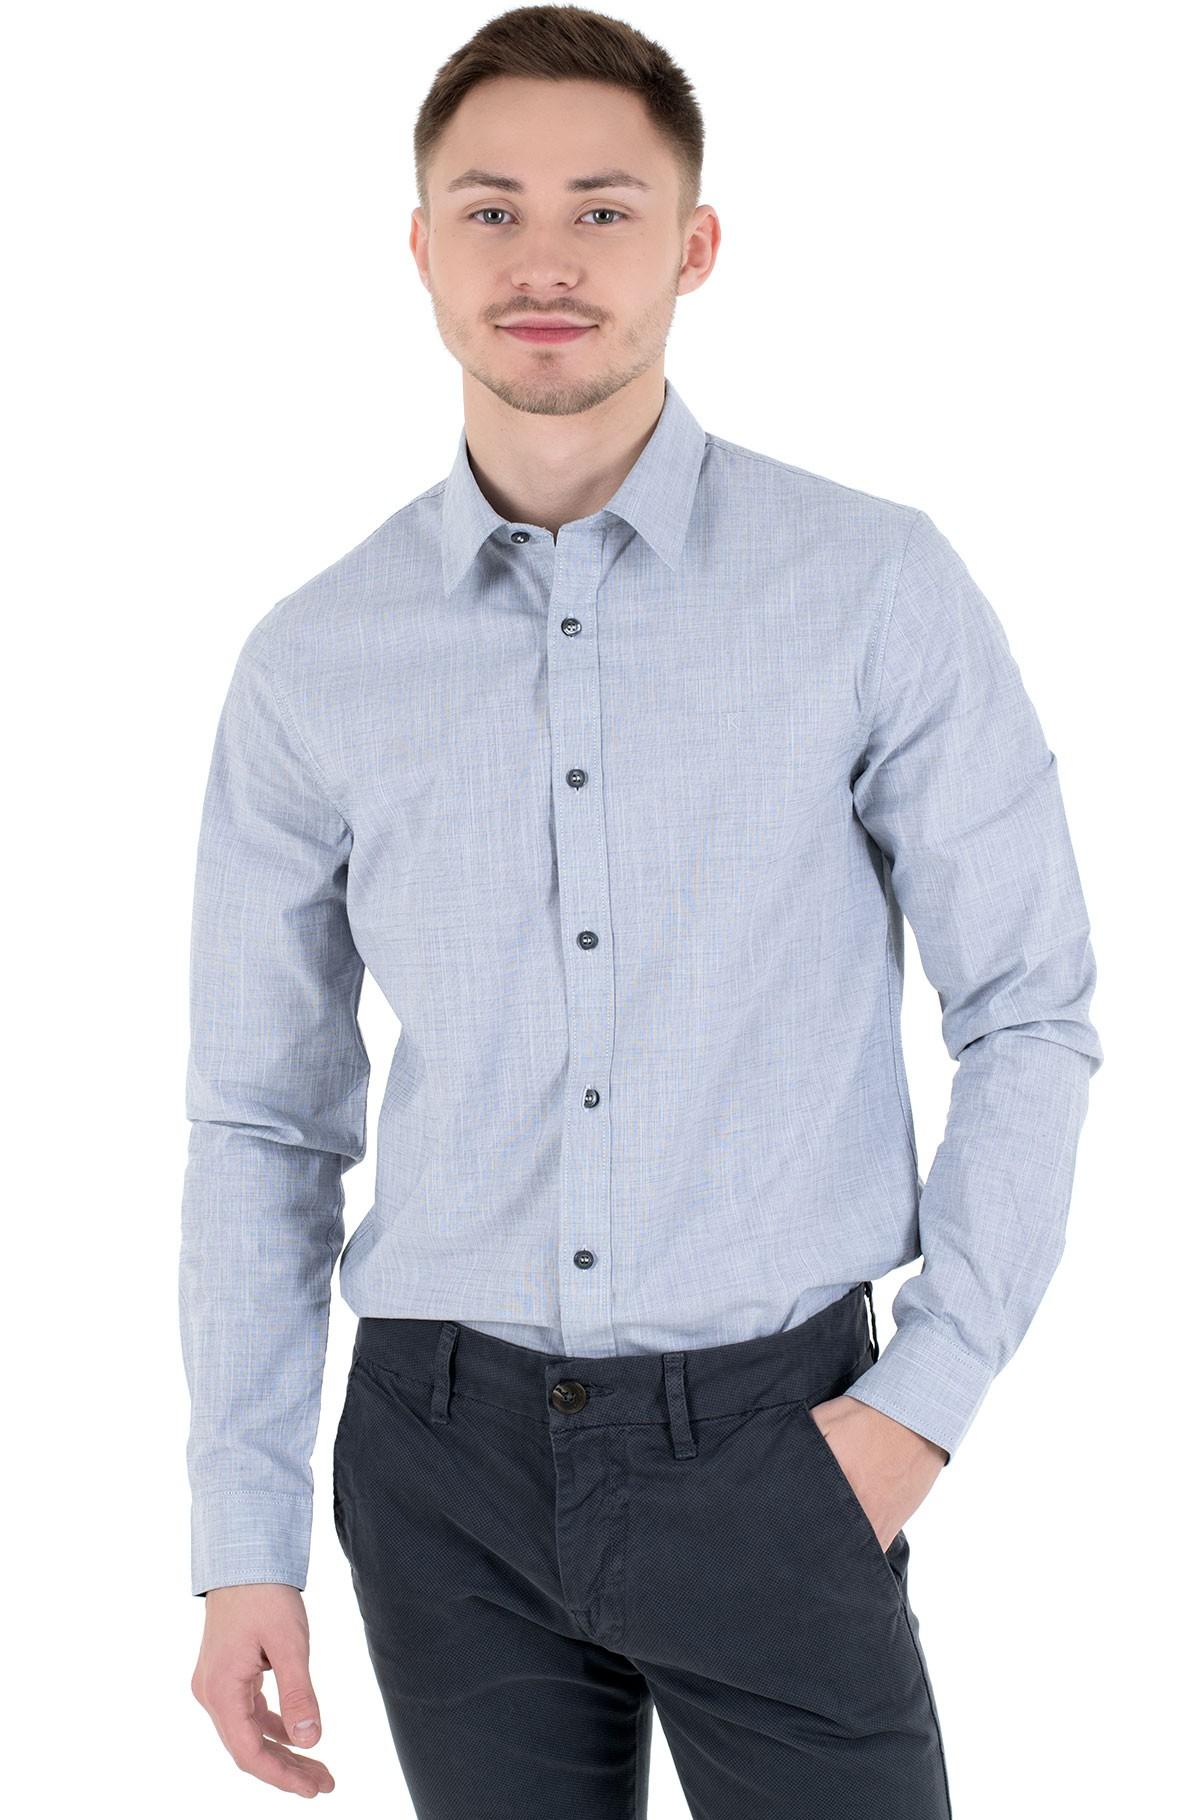 Marškiniai STRUCTURED SLIM STRETCH SHIRT-full-1